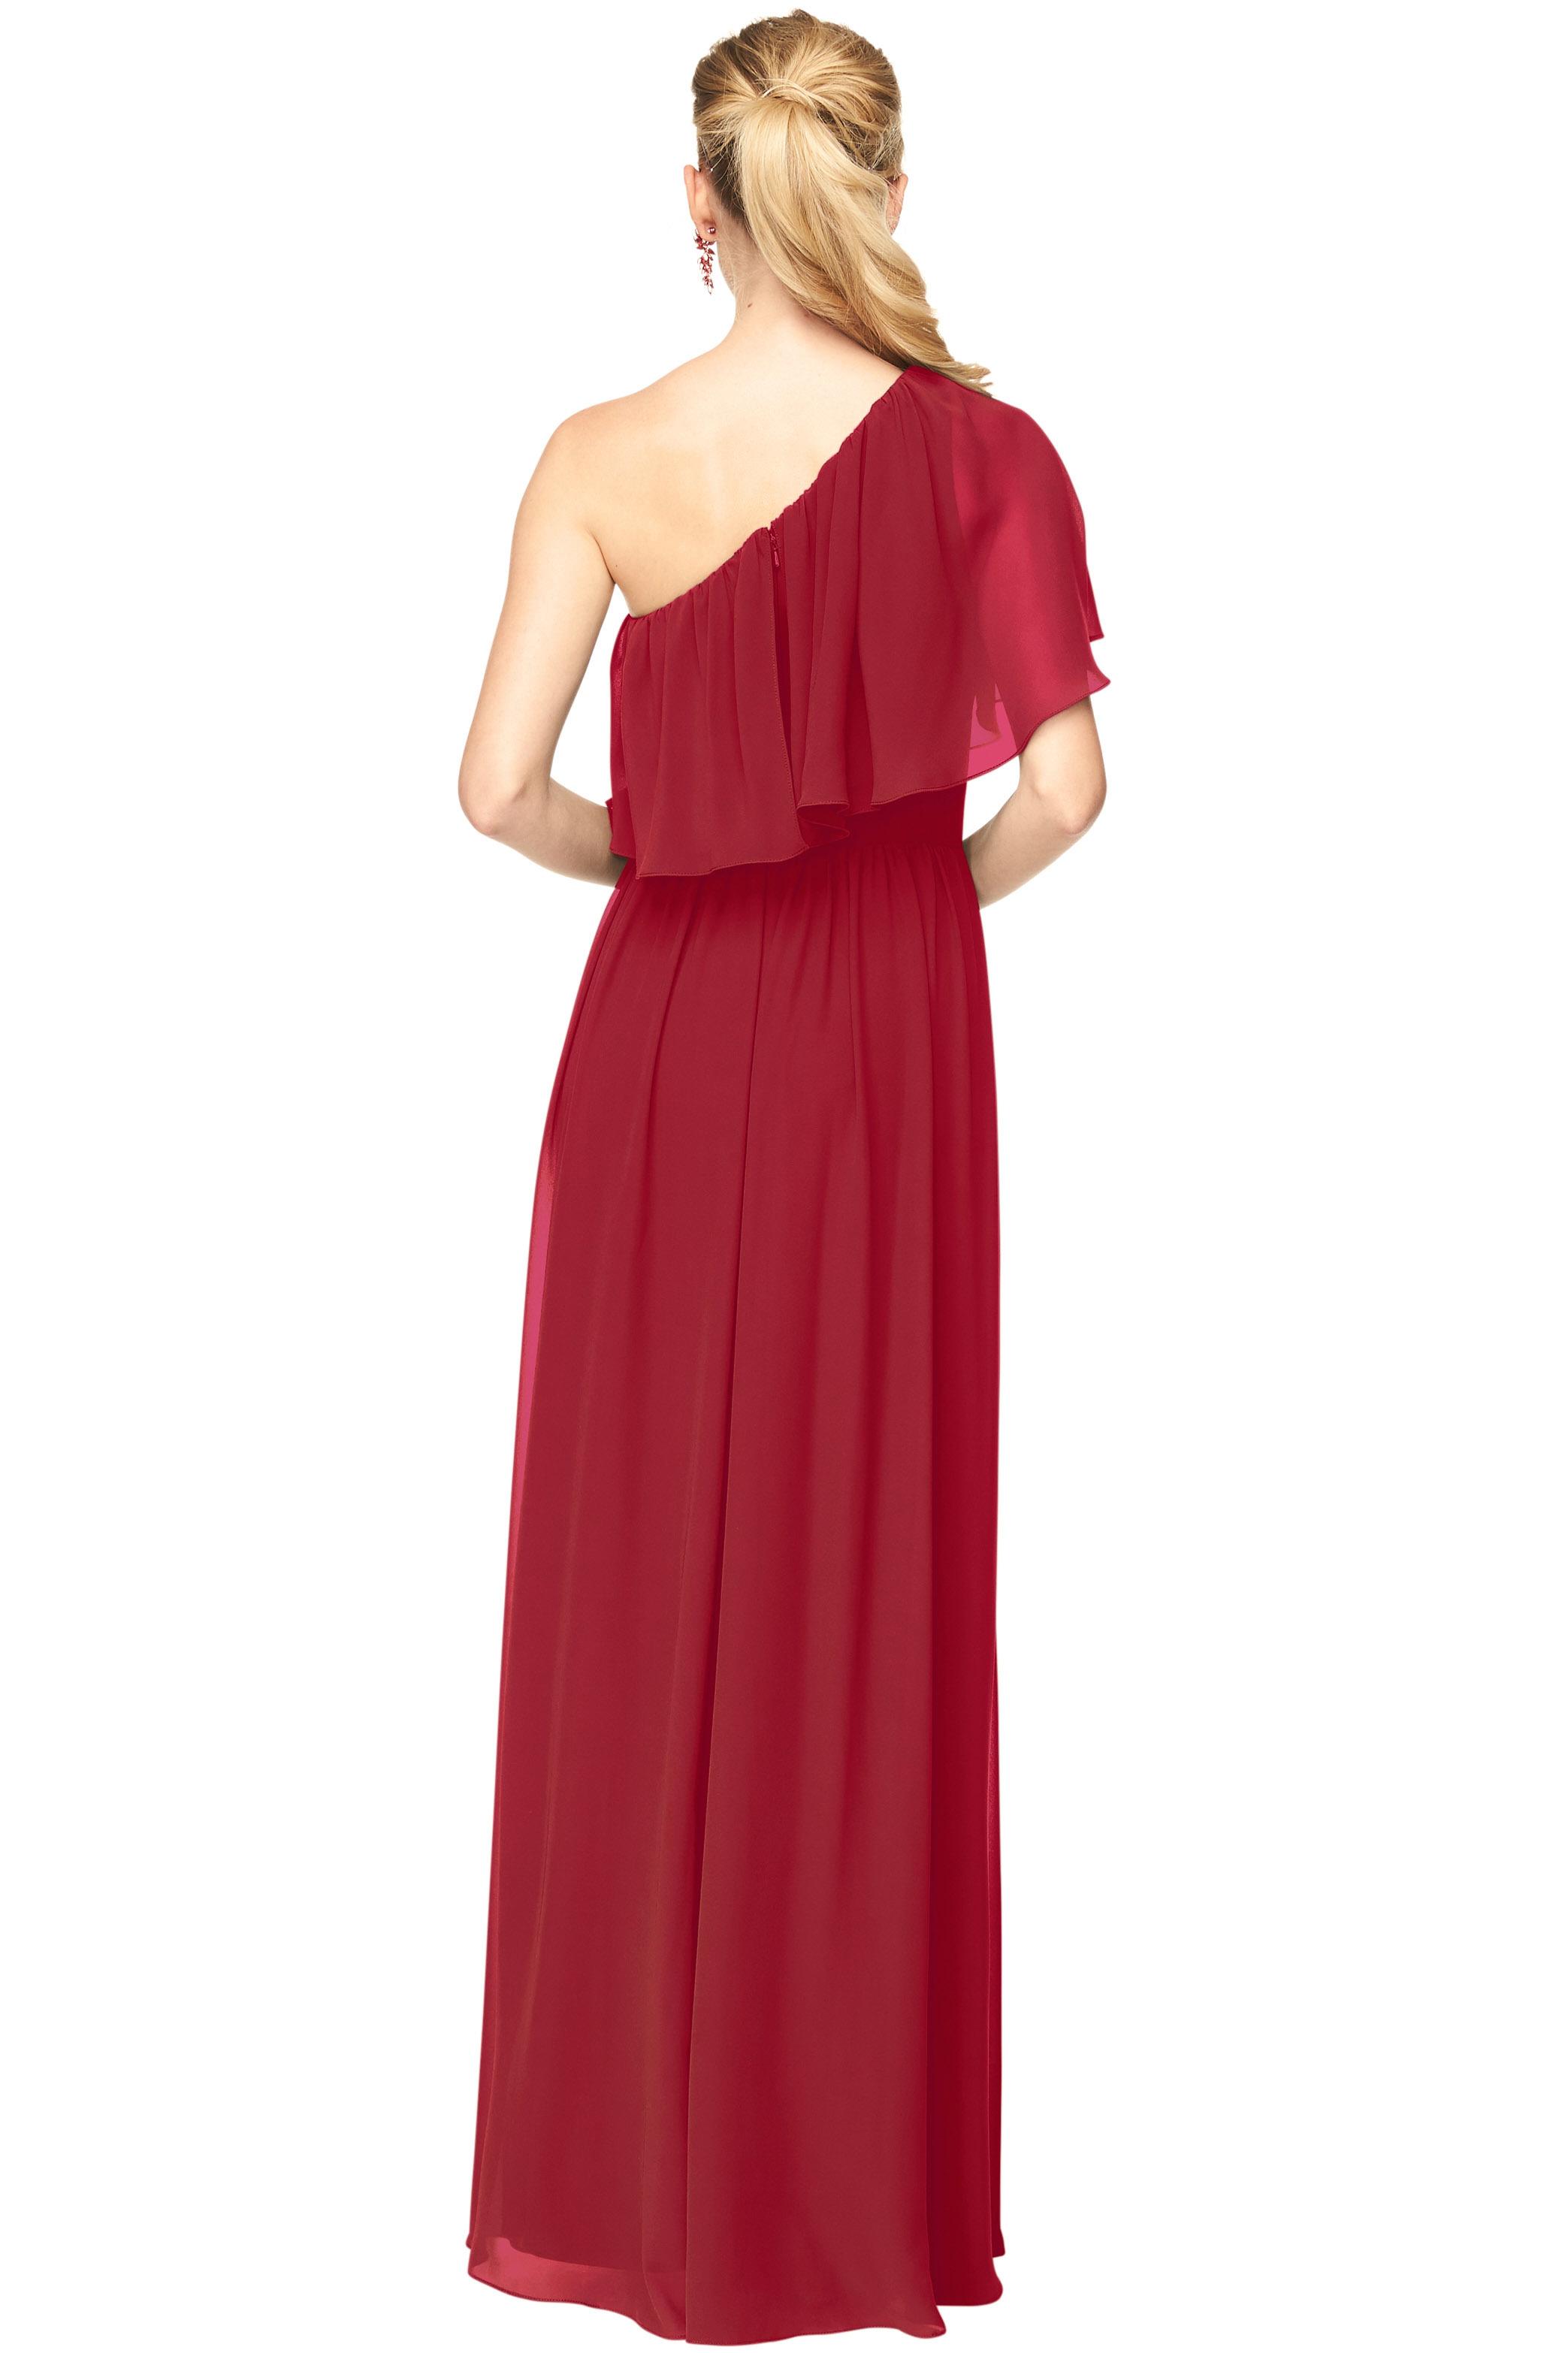 Bill Levkoff CRANBERRY Chiffon One Shoulder A-Line gown, $184.00 Back